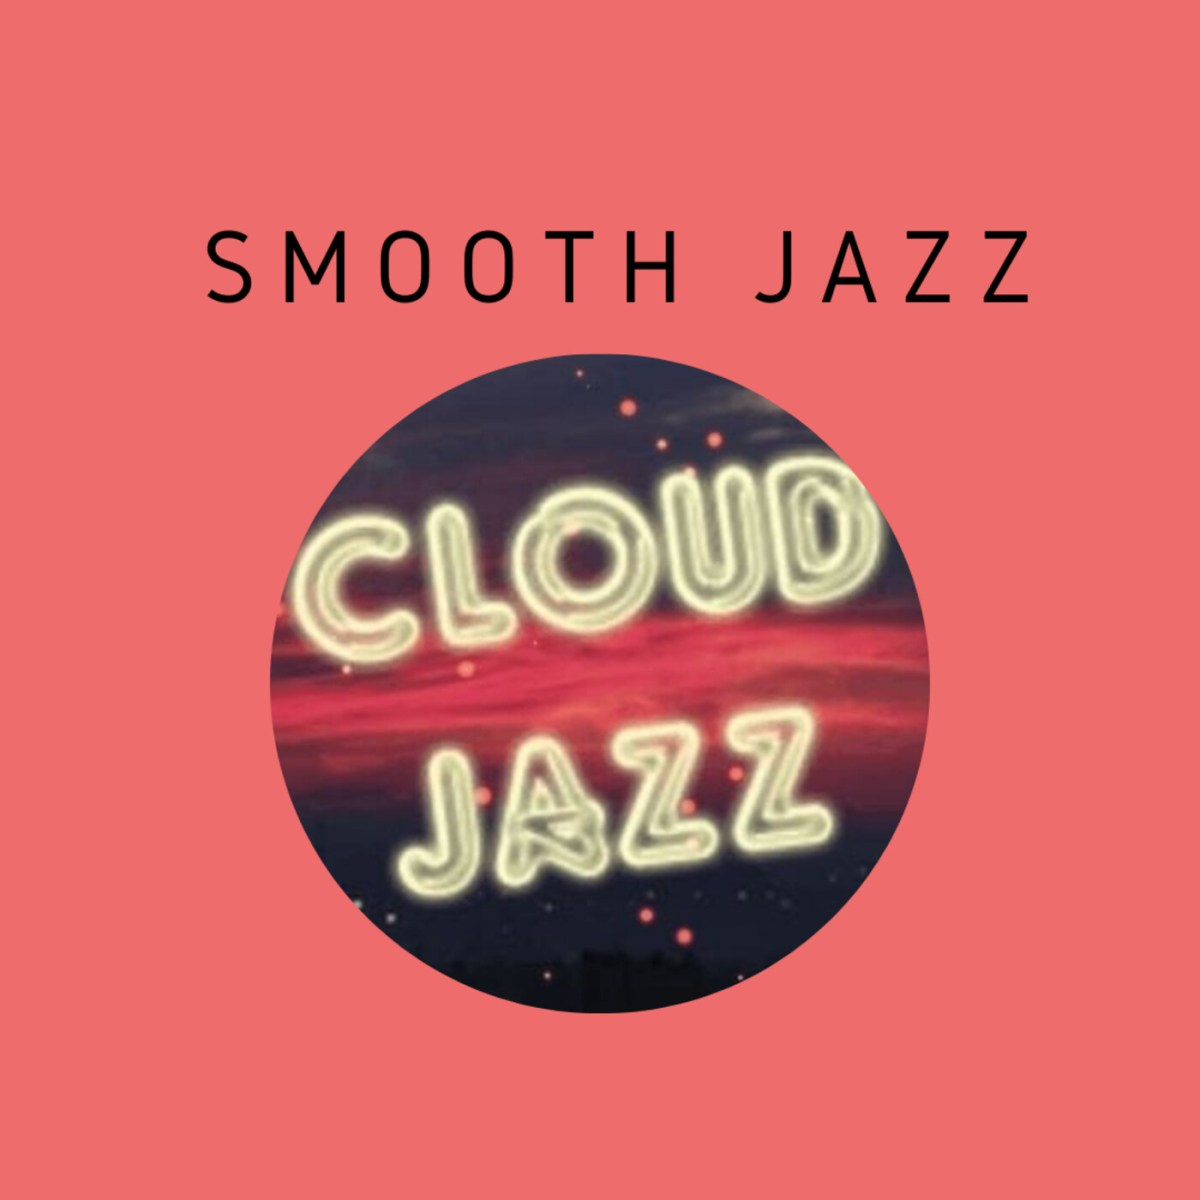 Cloud Jazz Smooth Jazz